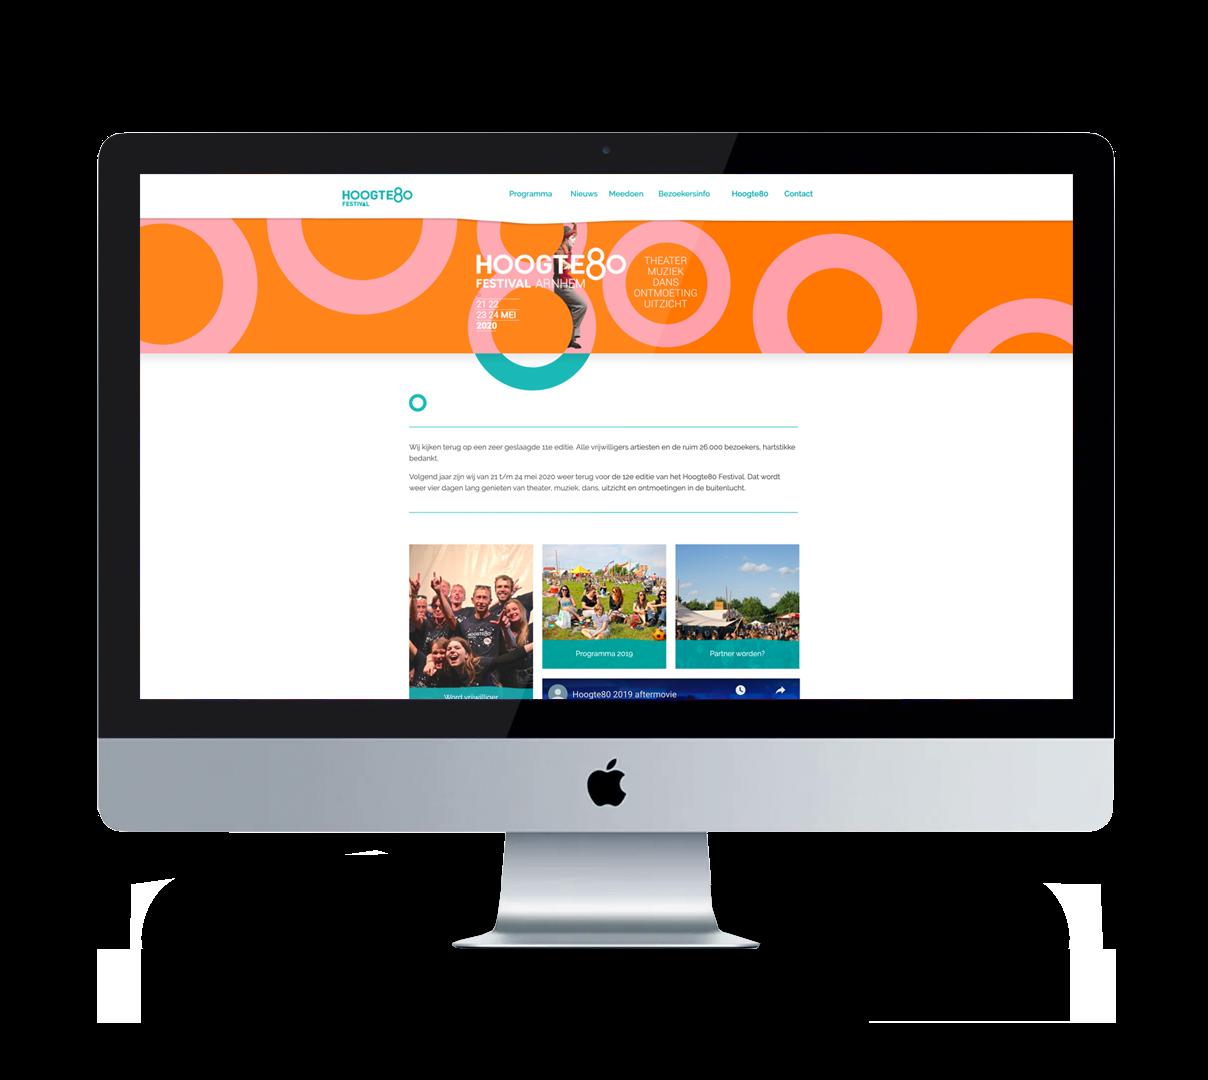 Hoogte80 festival-website